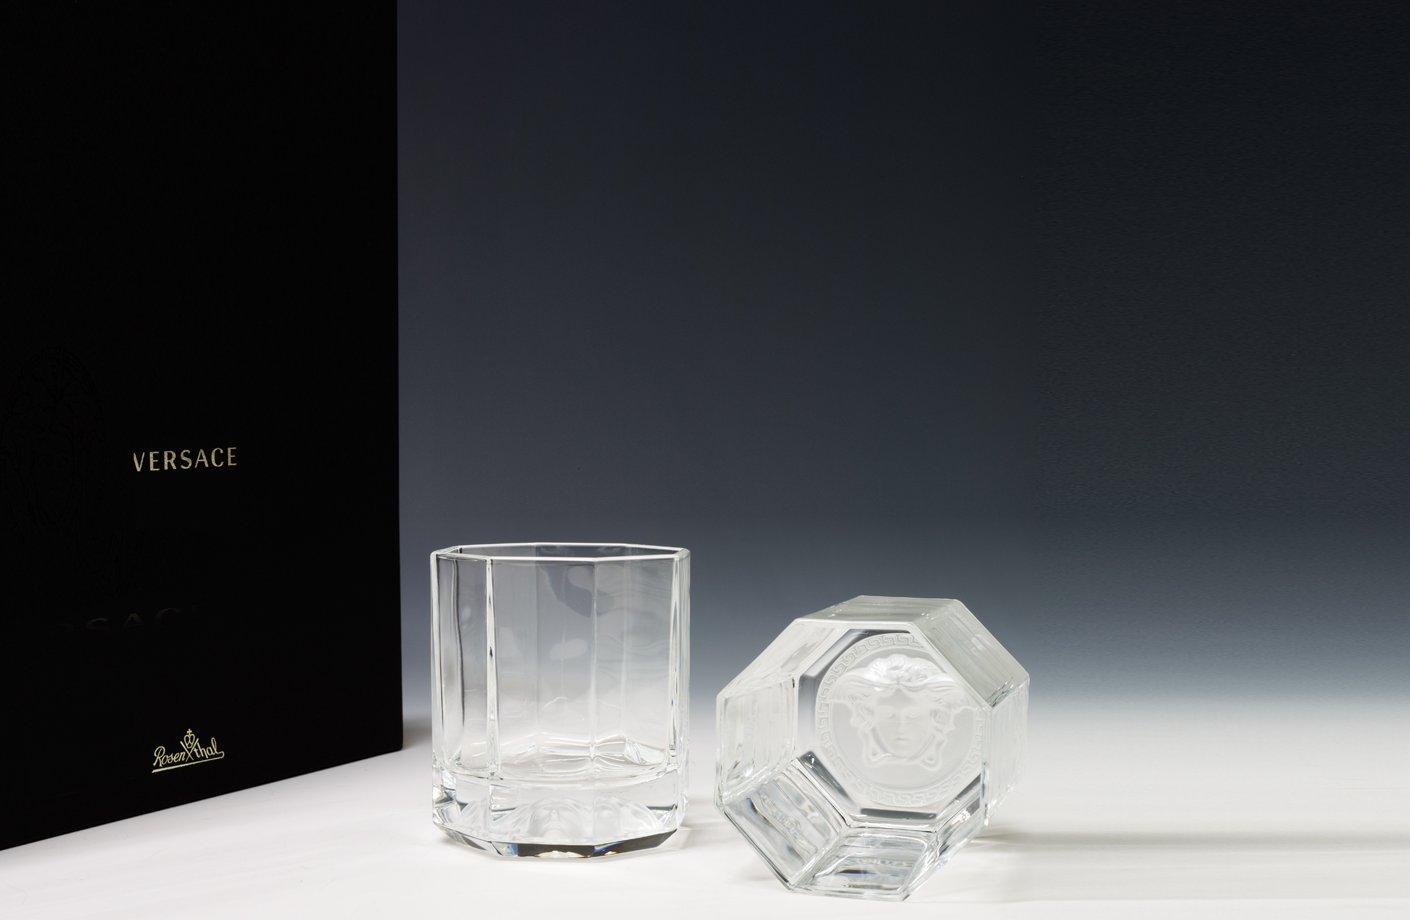 medusa lumiere whisky versace home australia. Black Bedroom Furniture Sets. Home Design Ideas